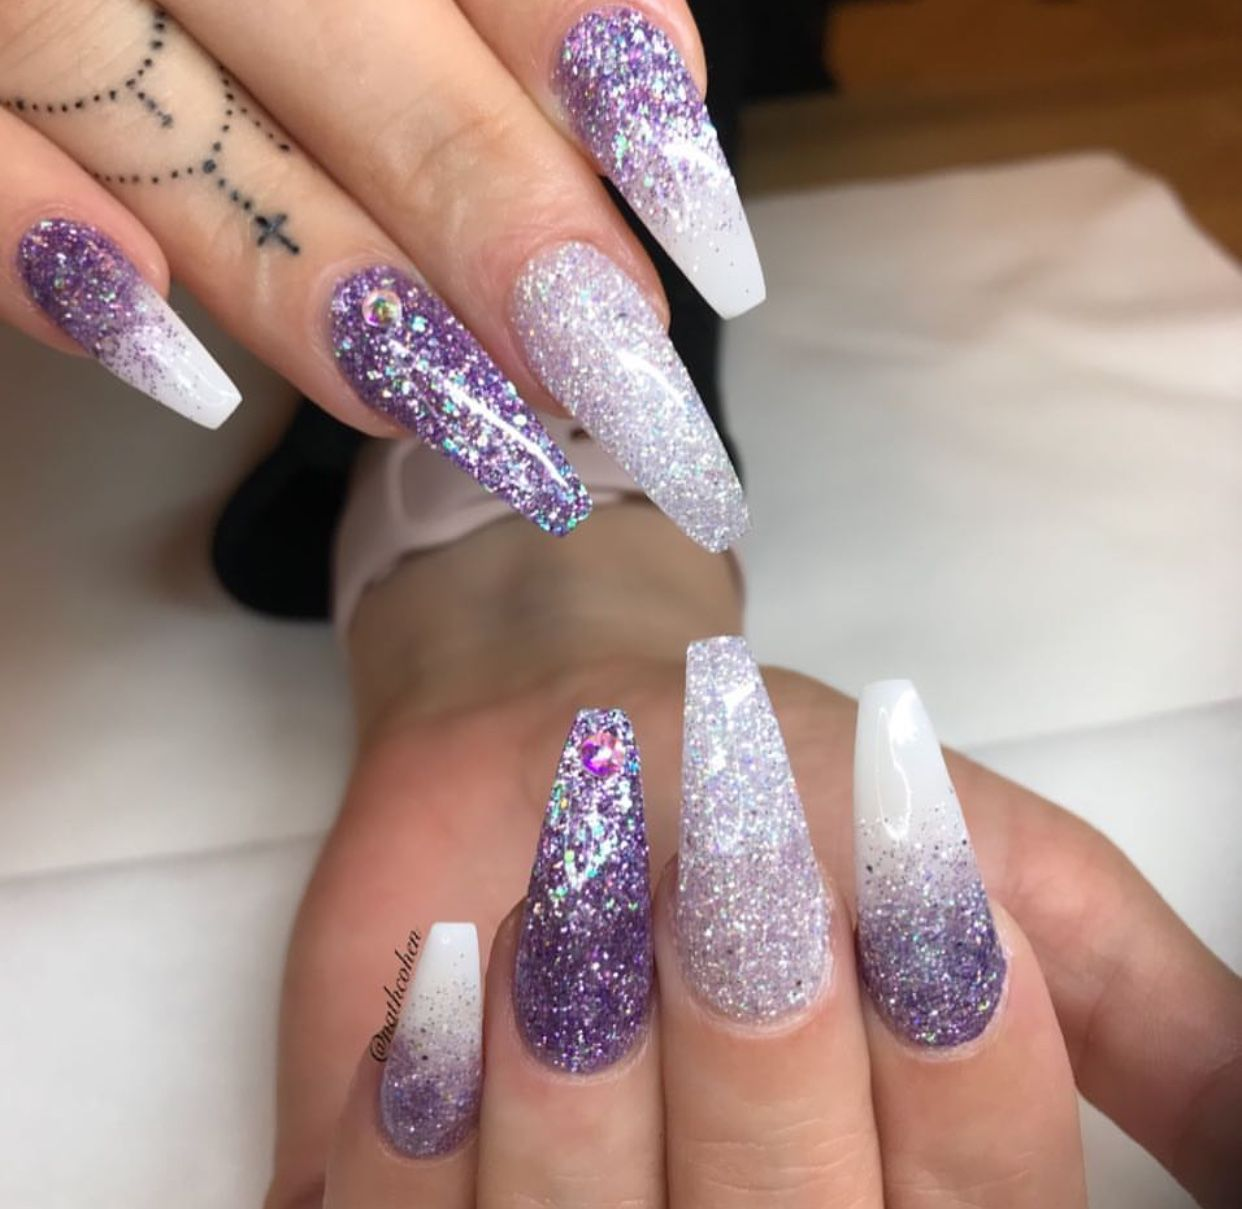 Purple White Nails | Glitter Nail Design | Coffin Acrylic ...